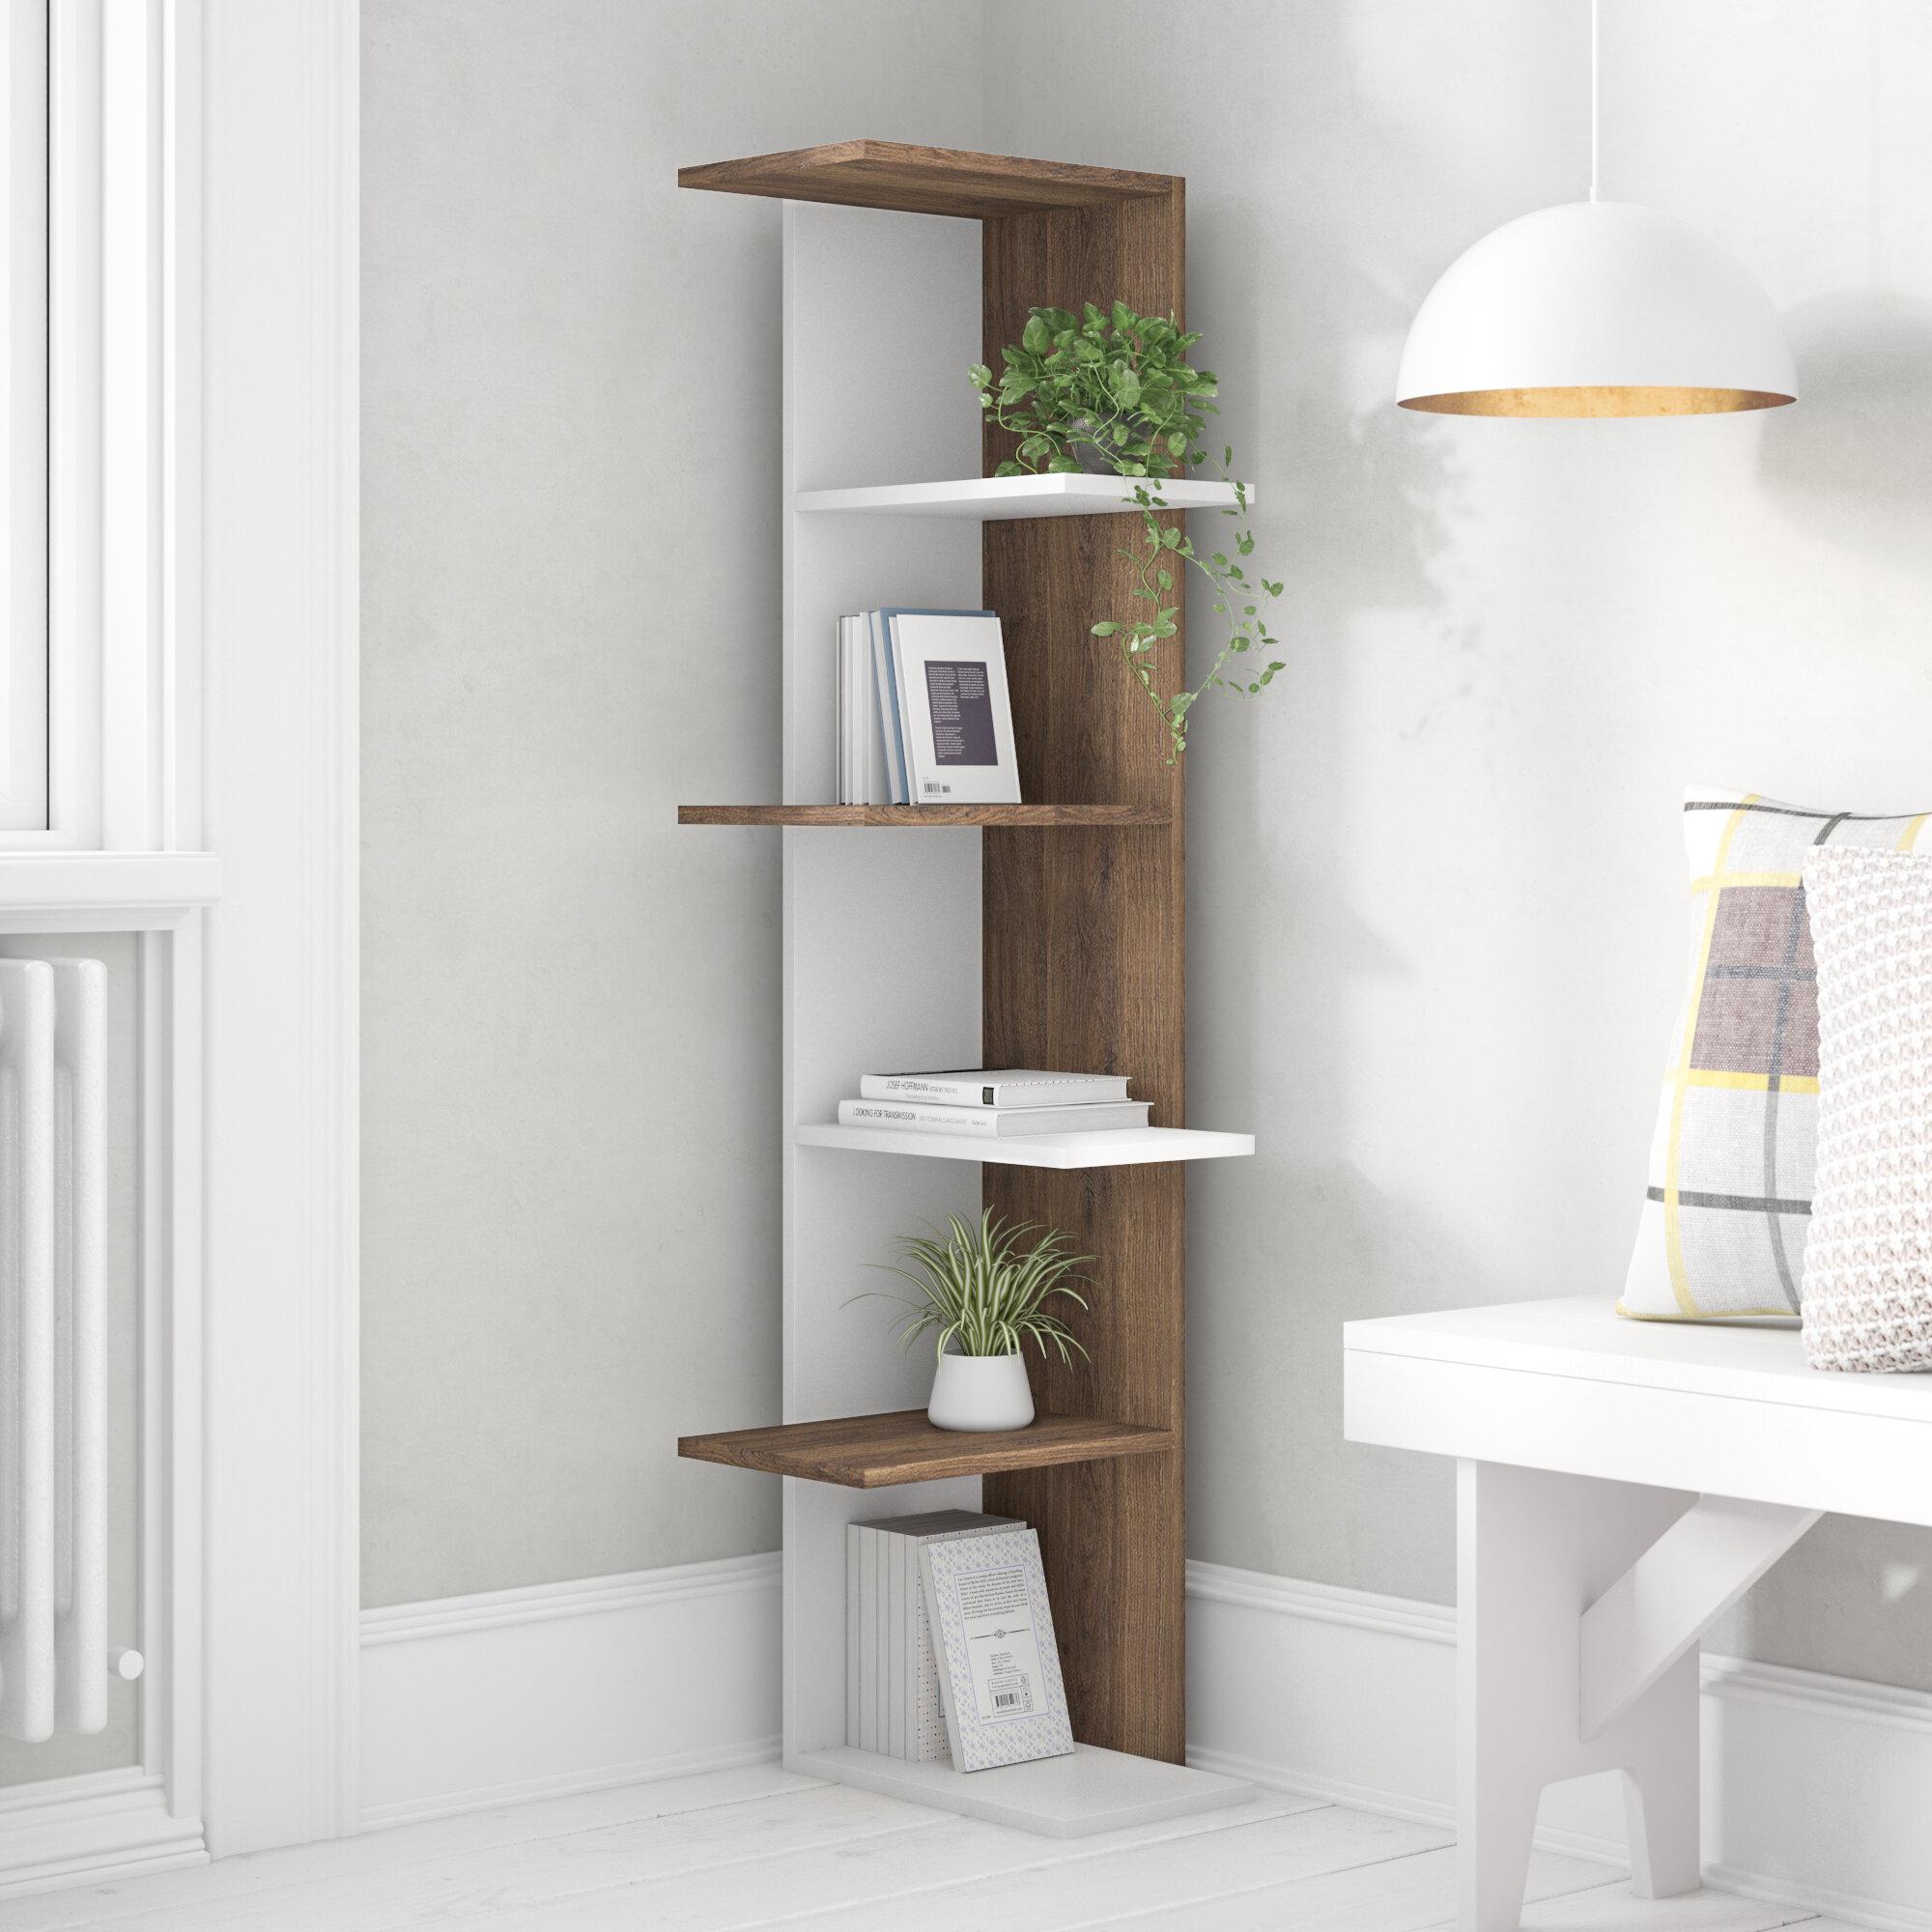 Symple stuff corner bookcase reviews wayfair co uk